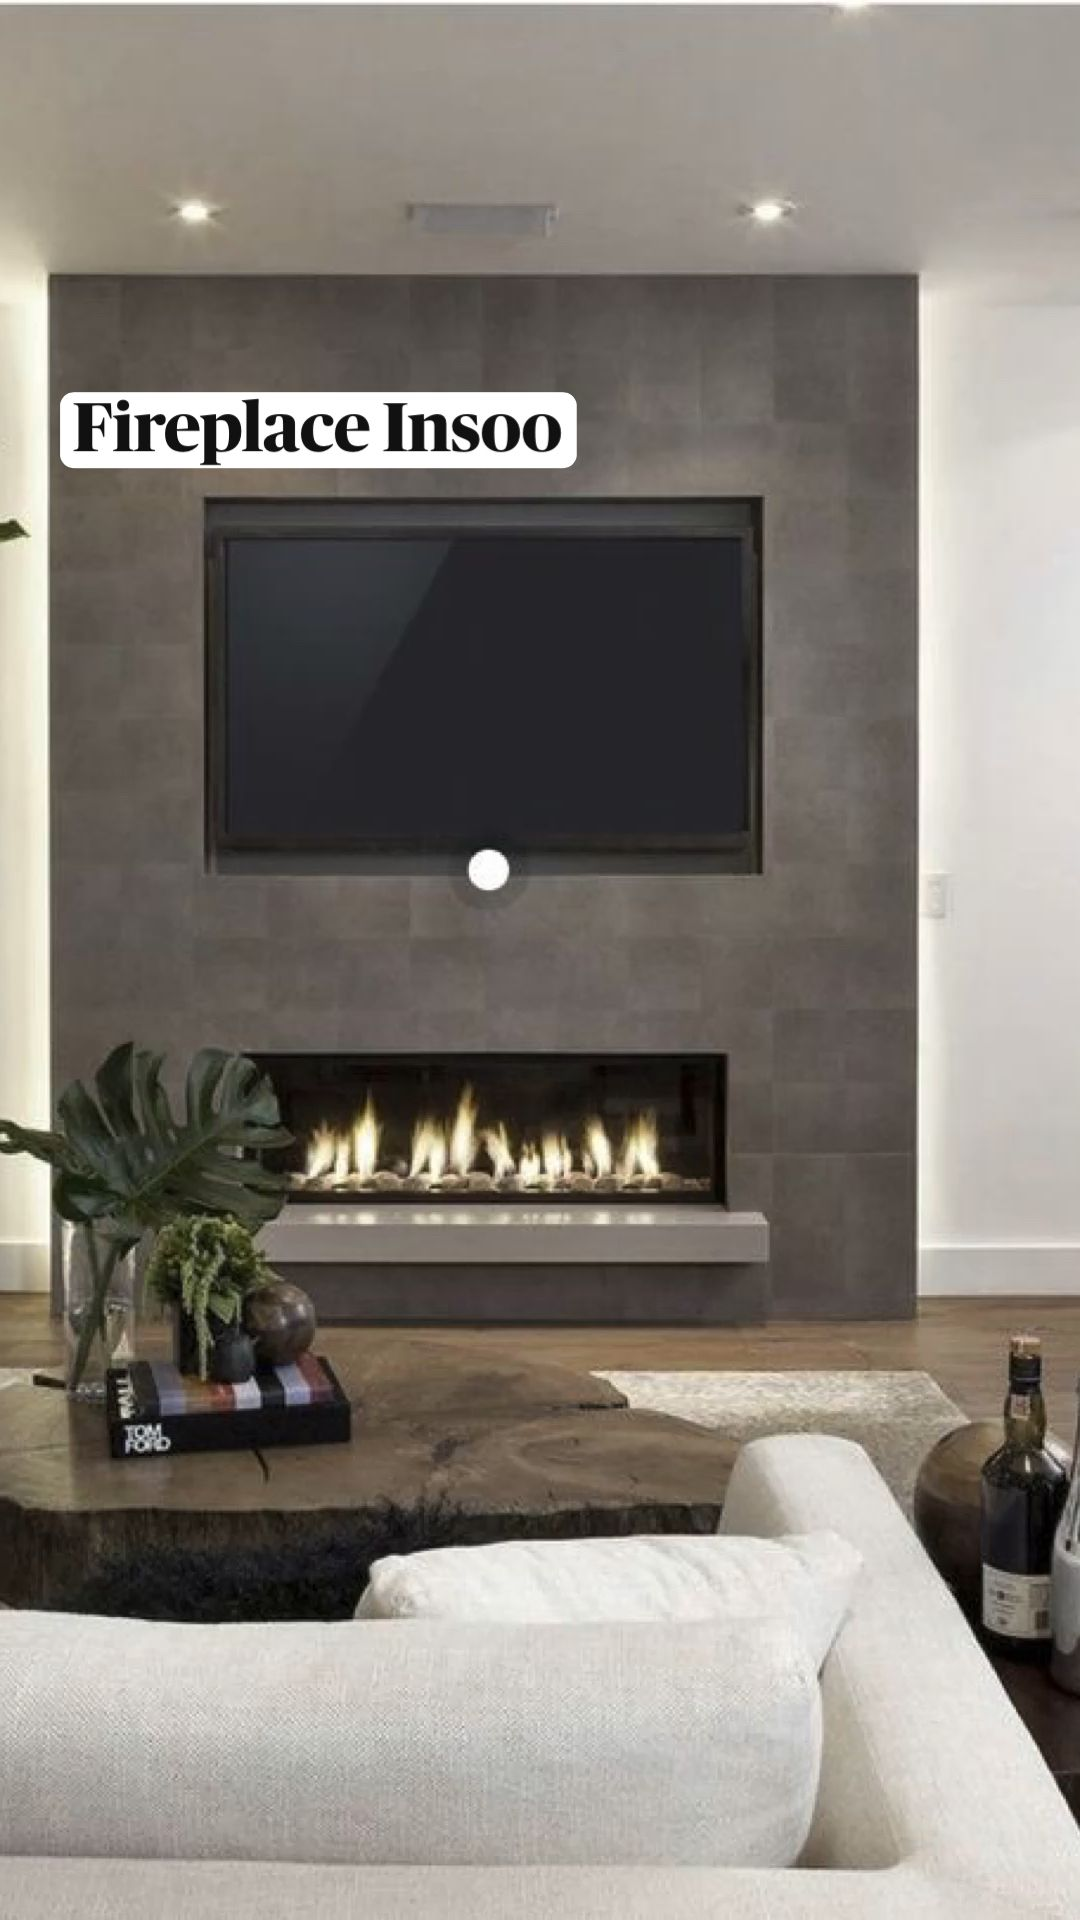 90+ Fireplace Insoo